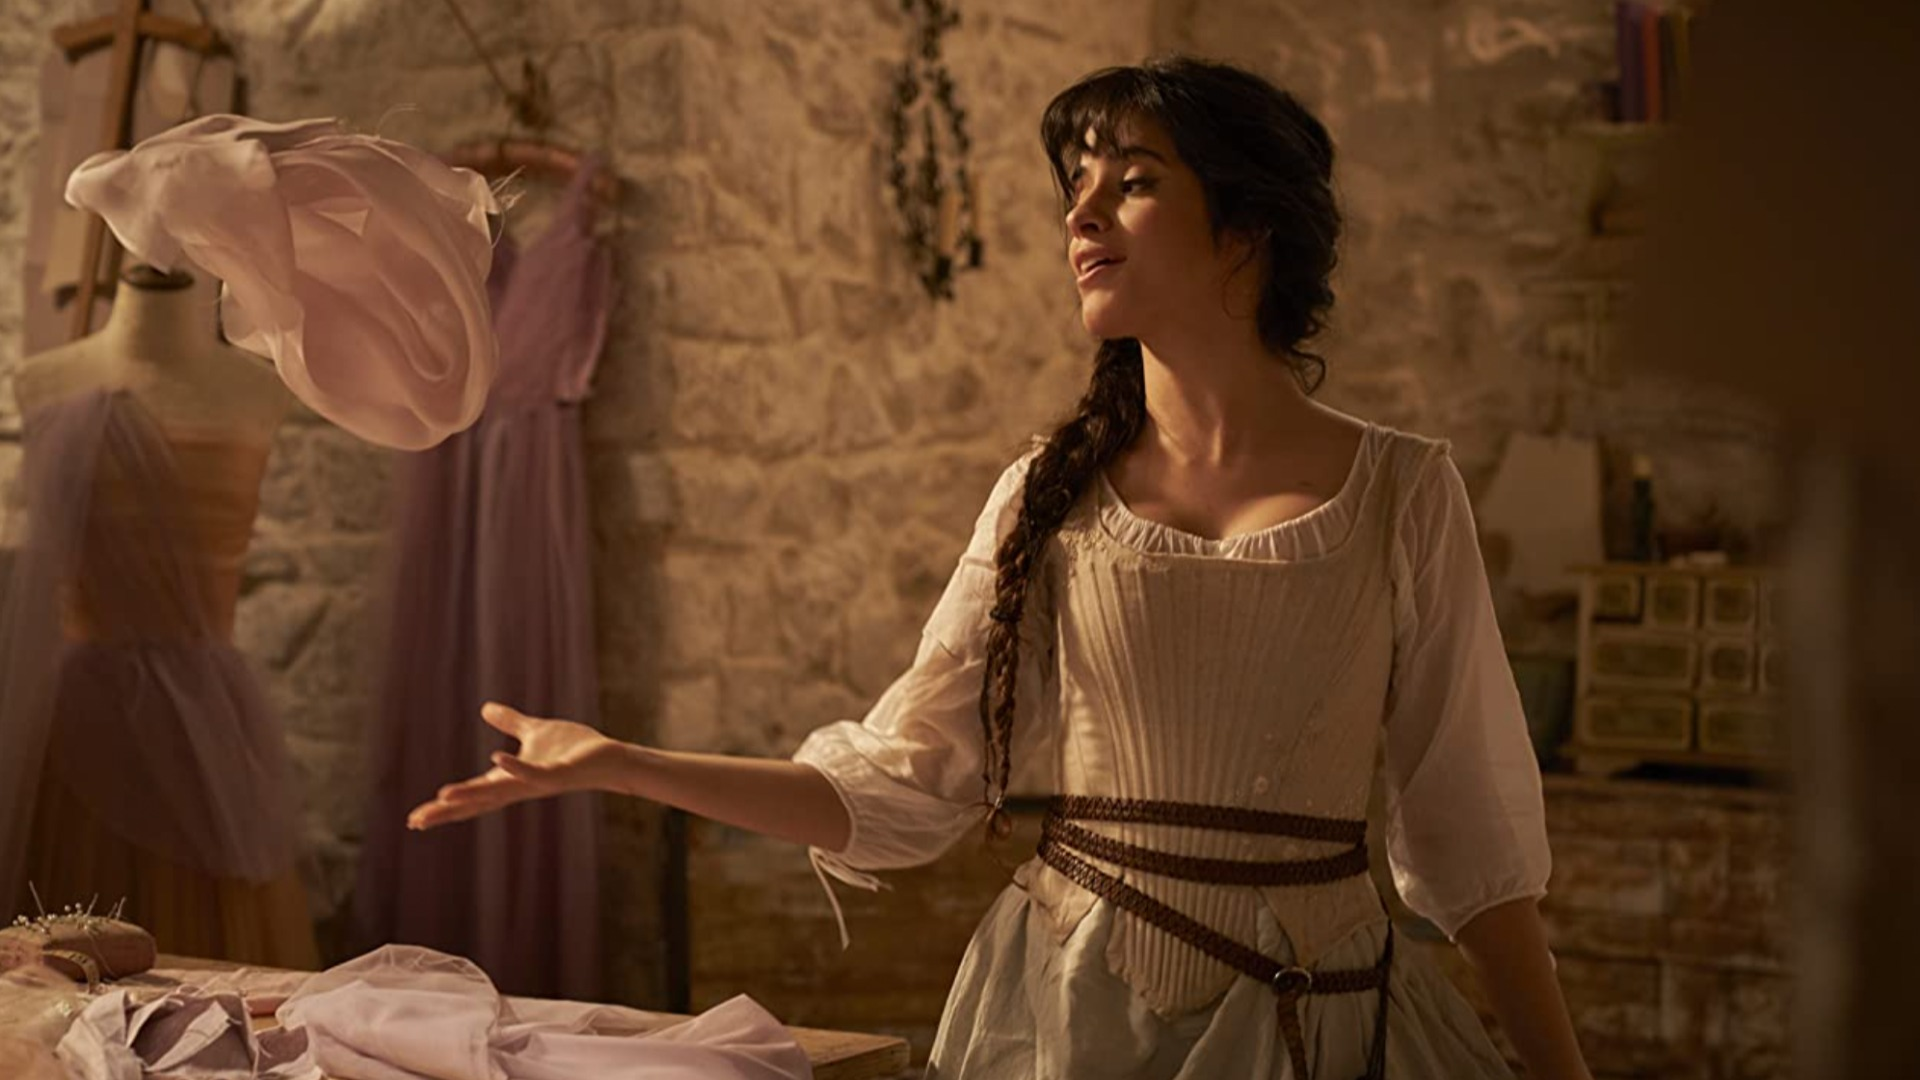 Camila Cabello in Cinderella